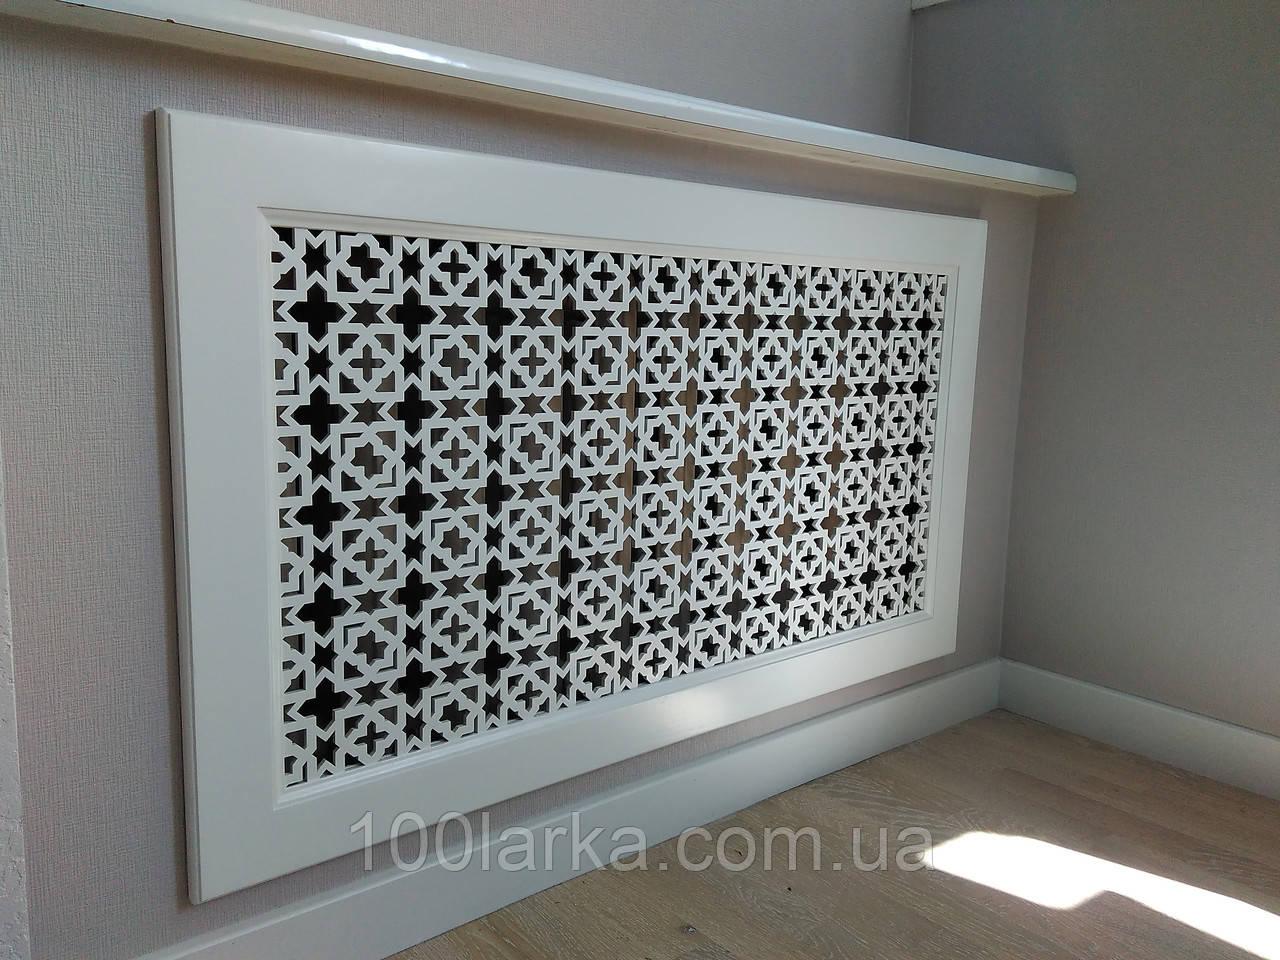 Декоративная решетка на нишу батареи отопления Экран (фасад) R19-F60 белый